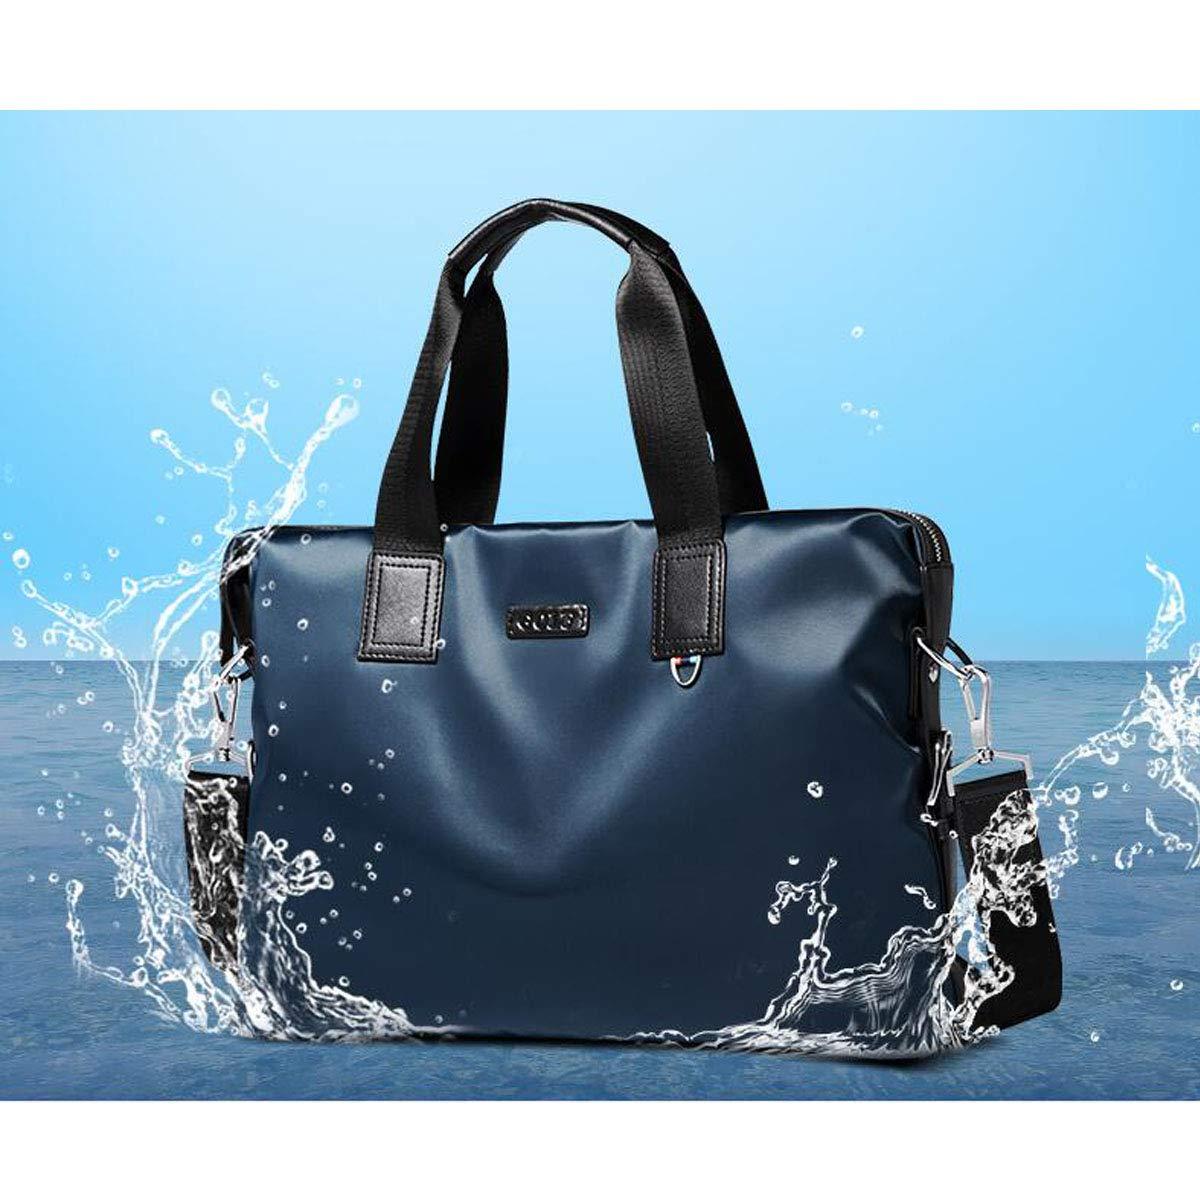 37.5 8 29cm mens handbag large-capacity computer bag Briefcase